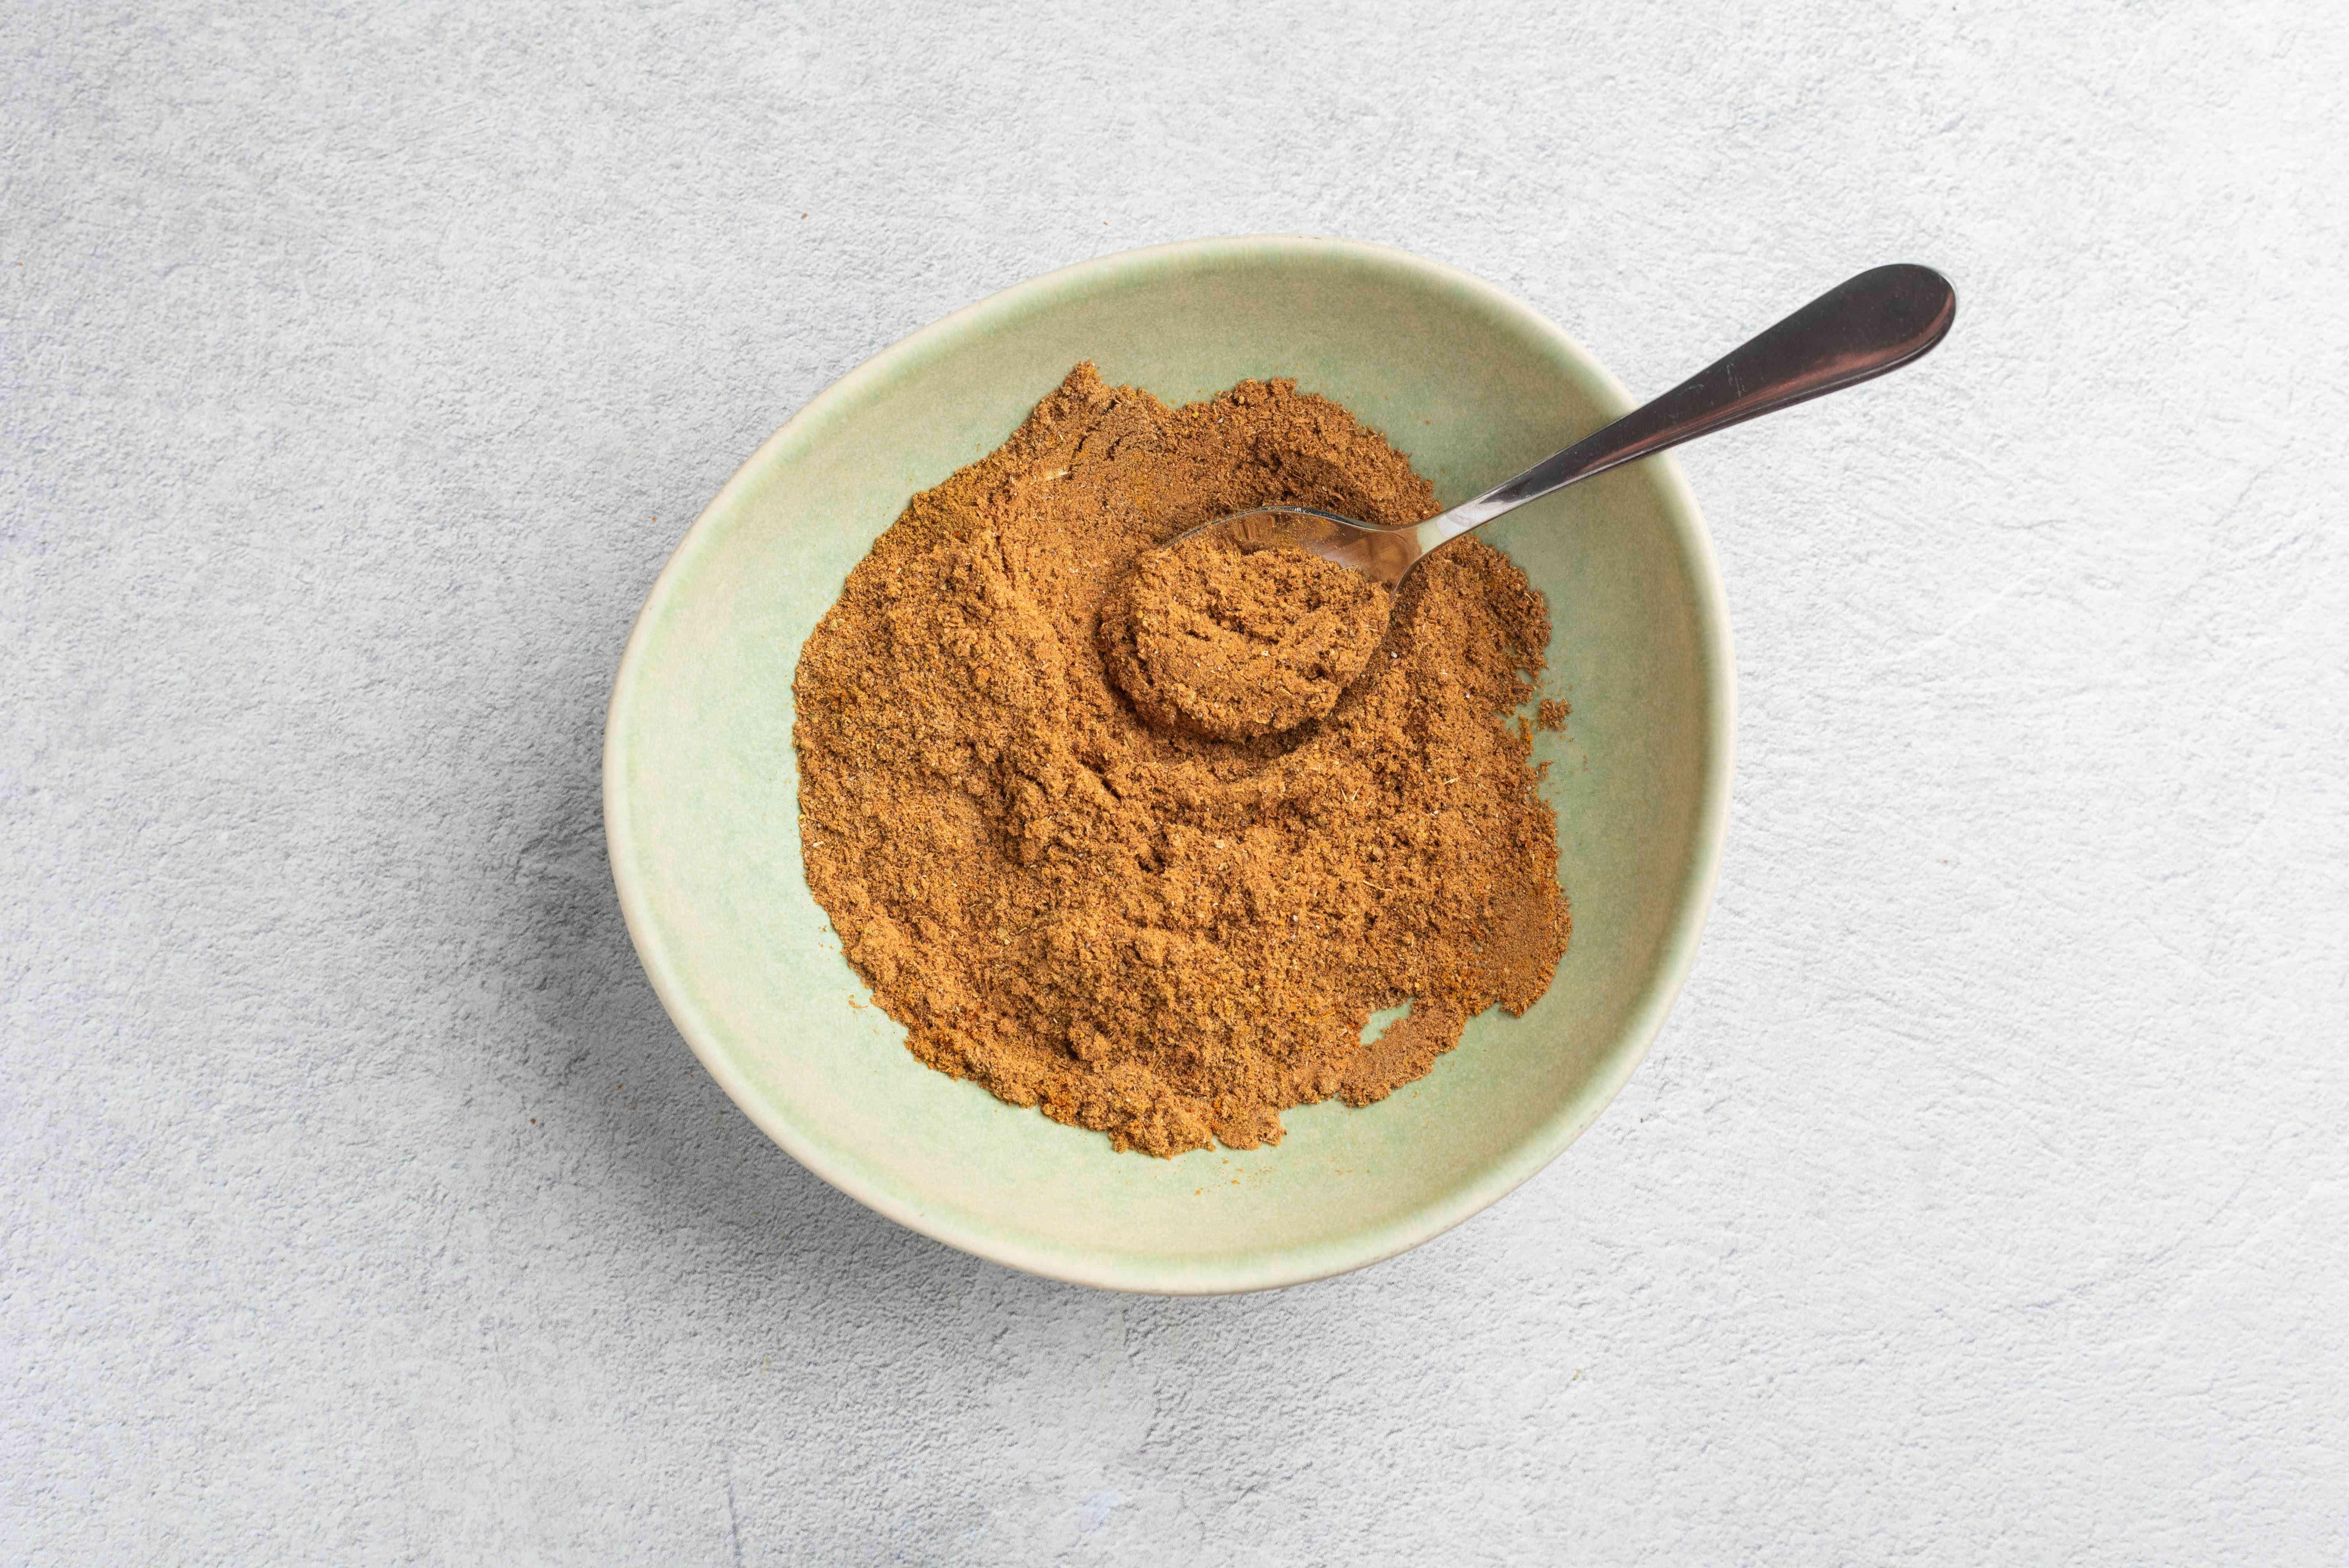 Mix the turmeric